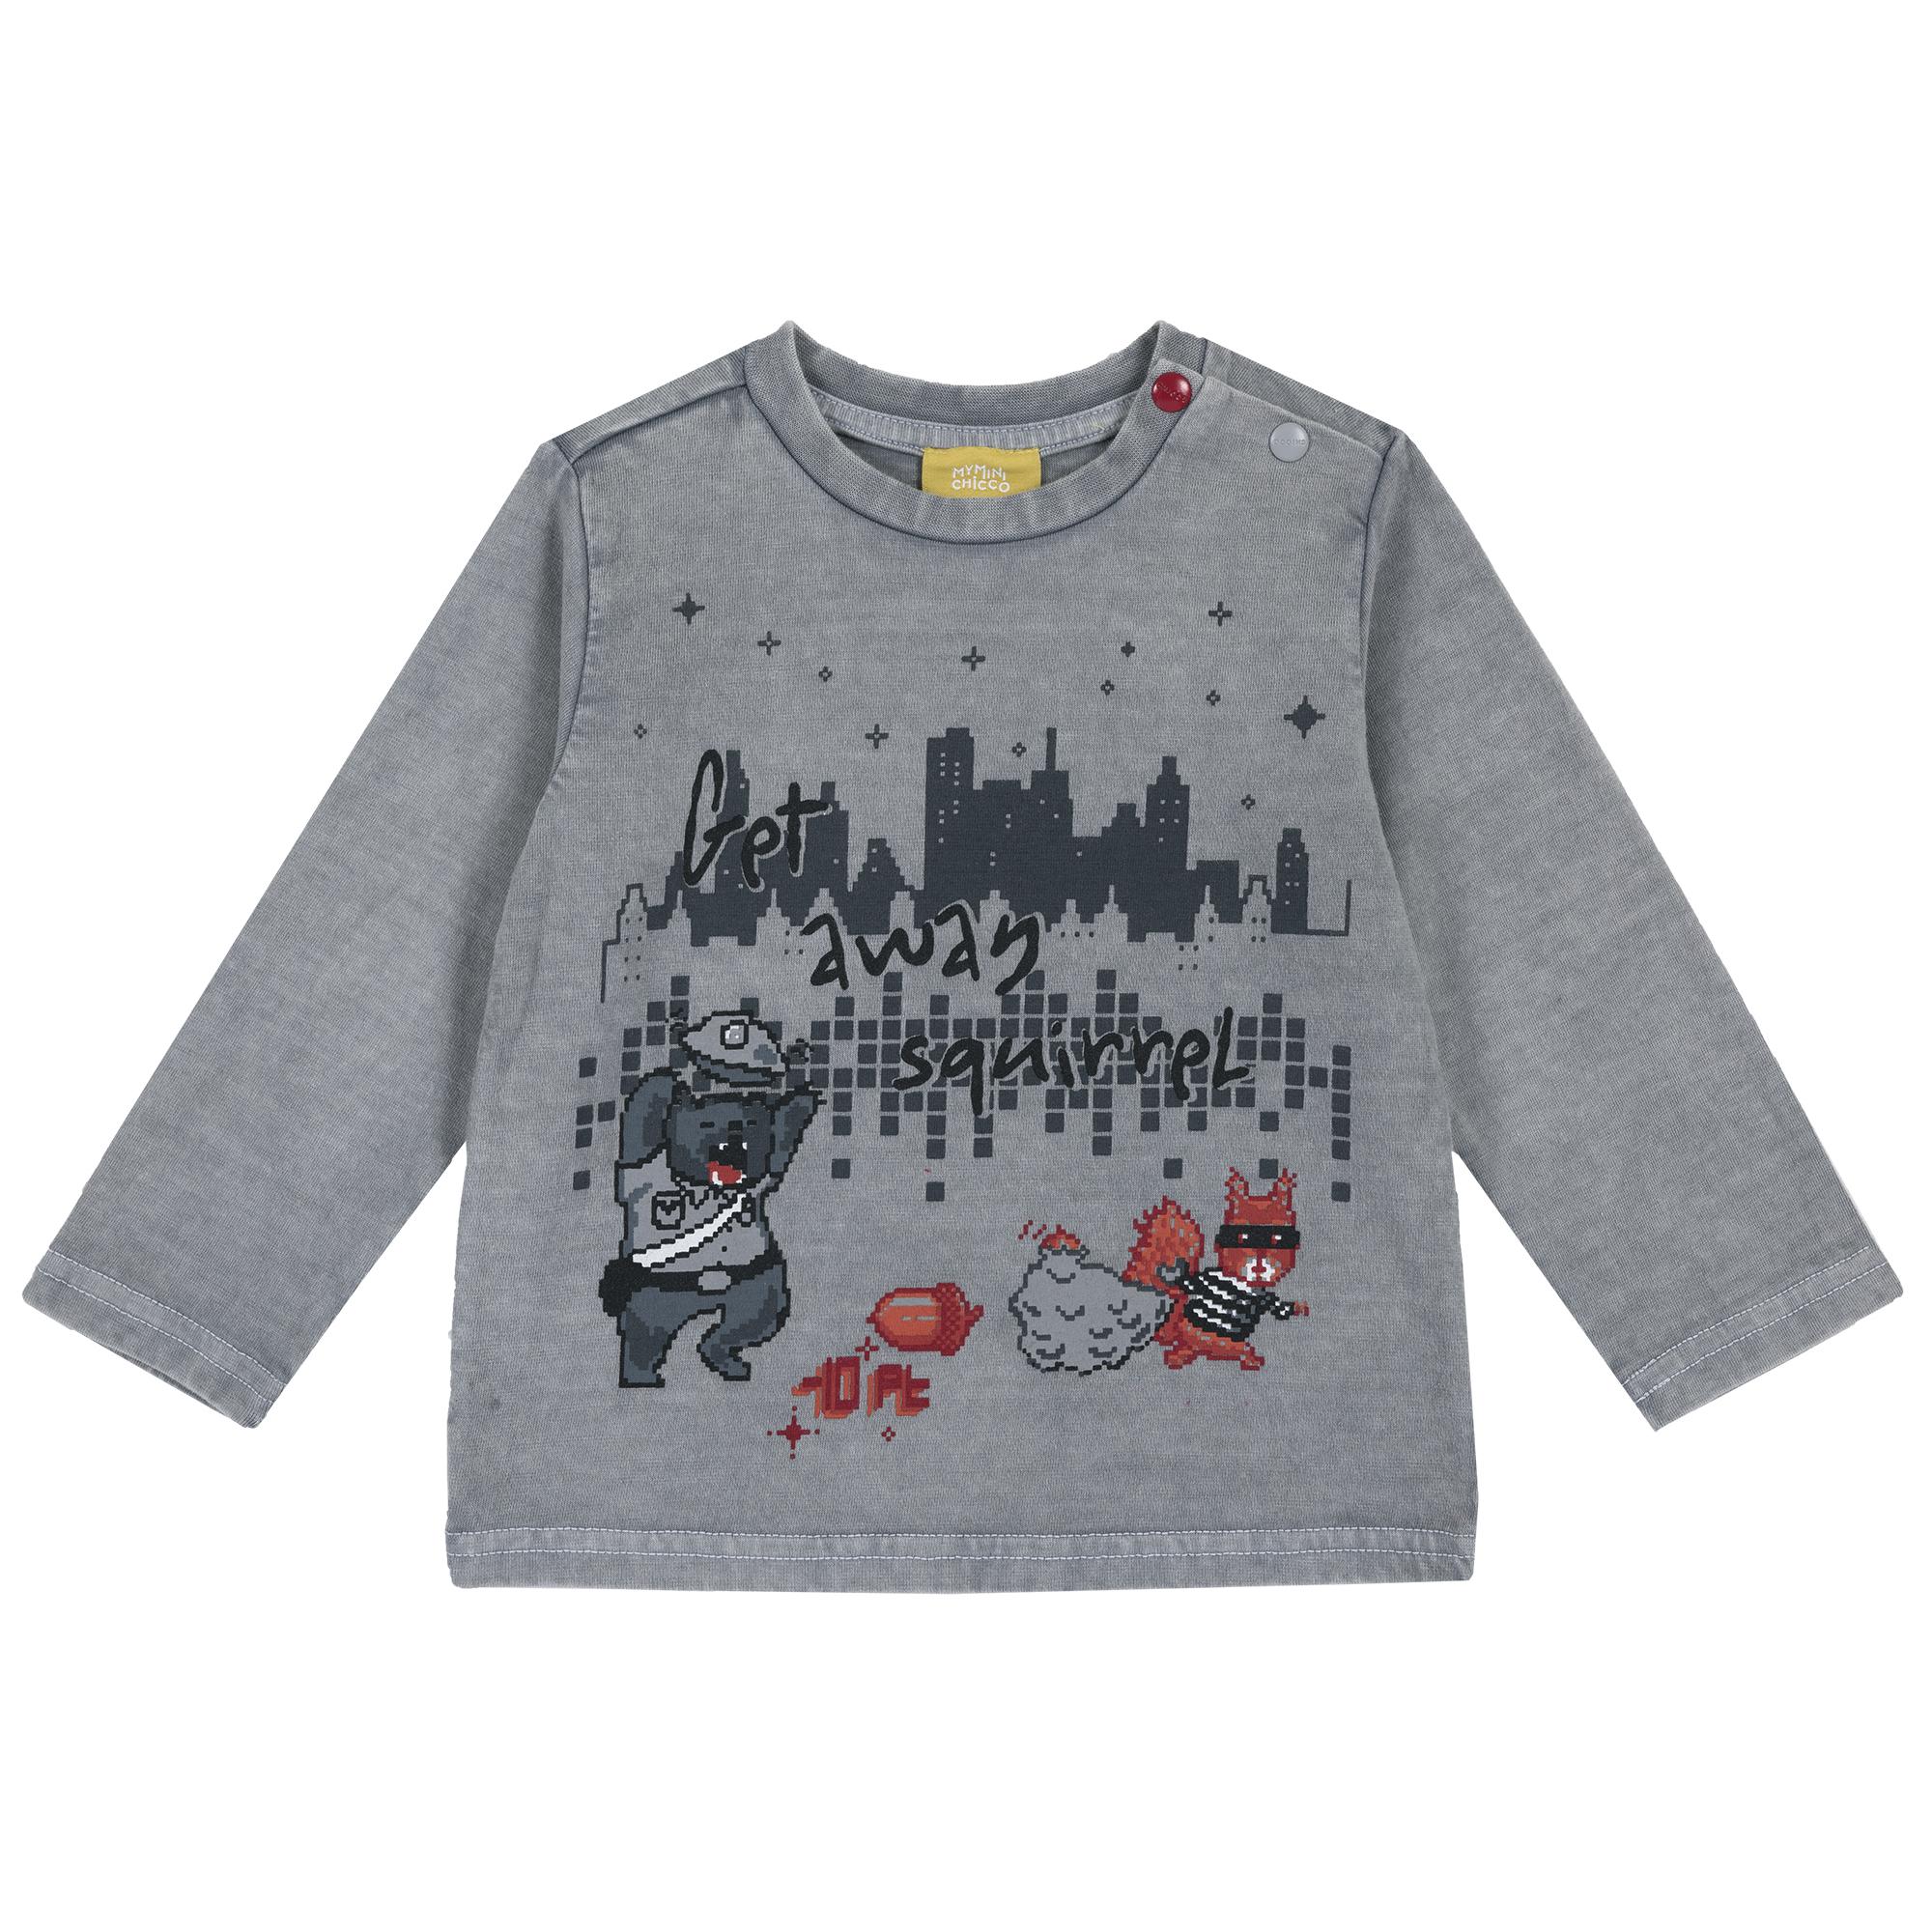 Tricou copii Chicco, maneca lunga, gri, 06758 din categoria Tricouri copii